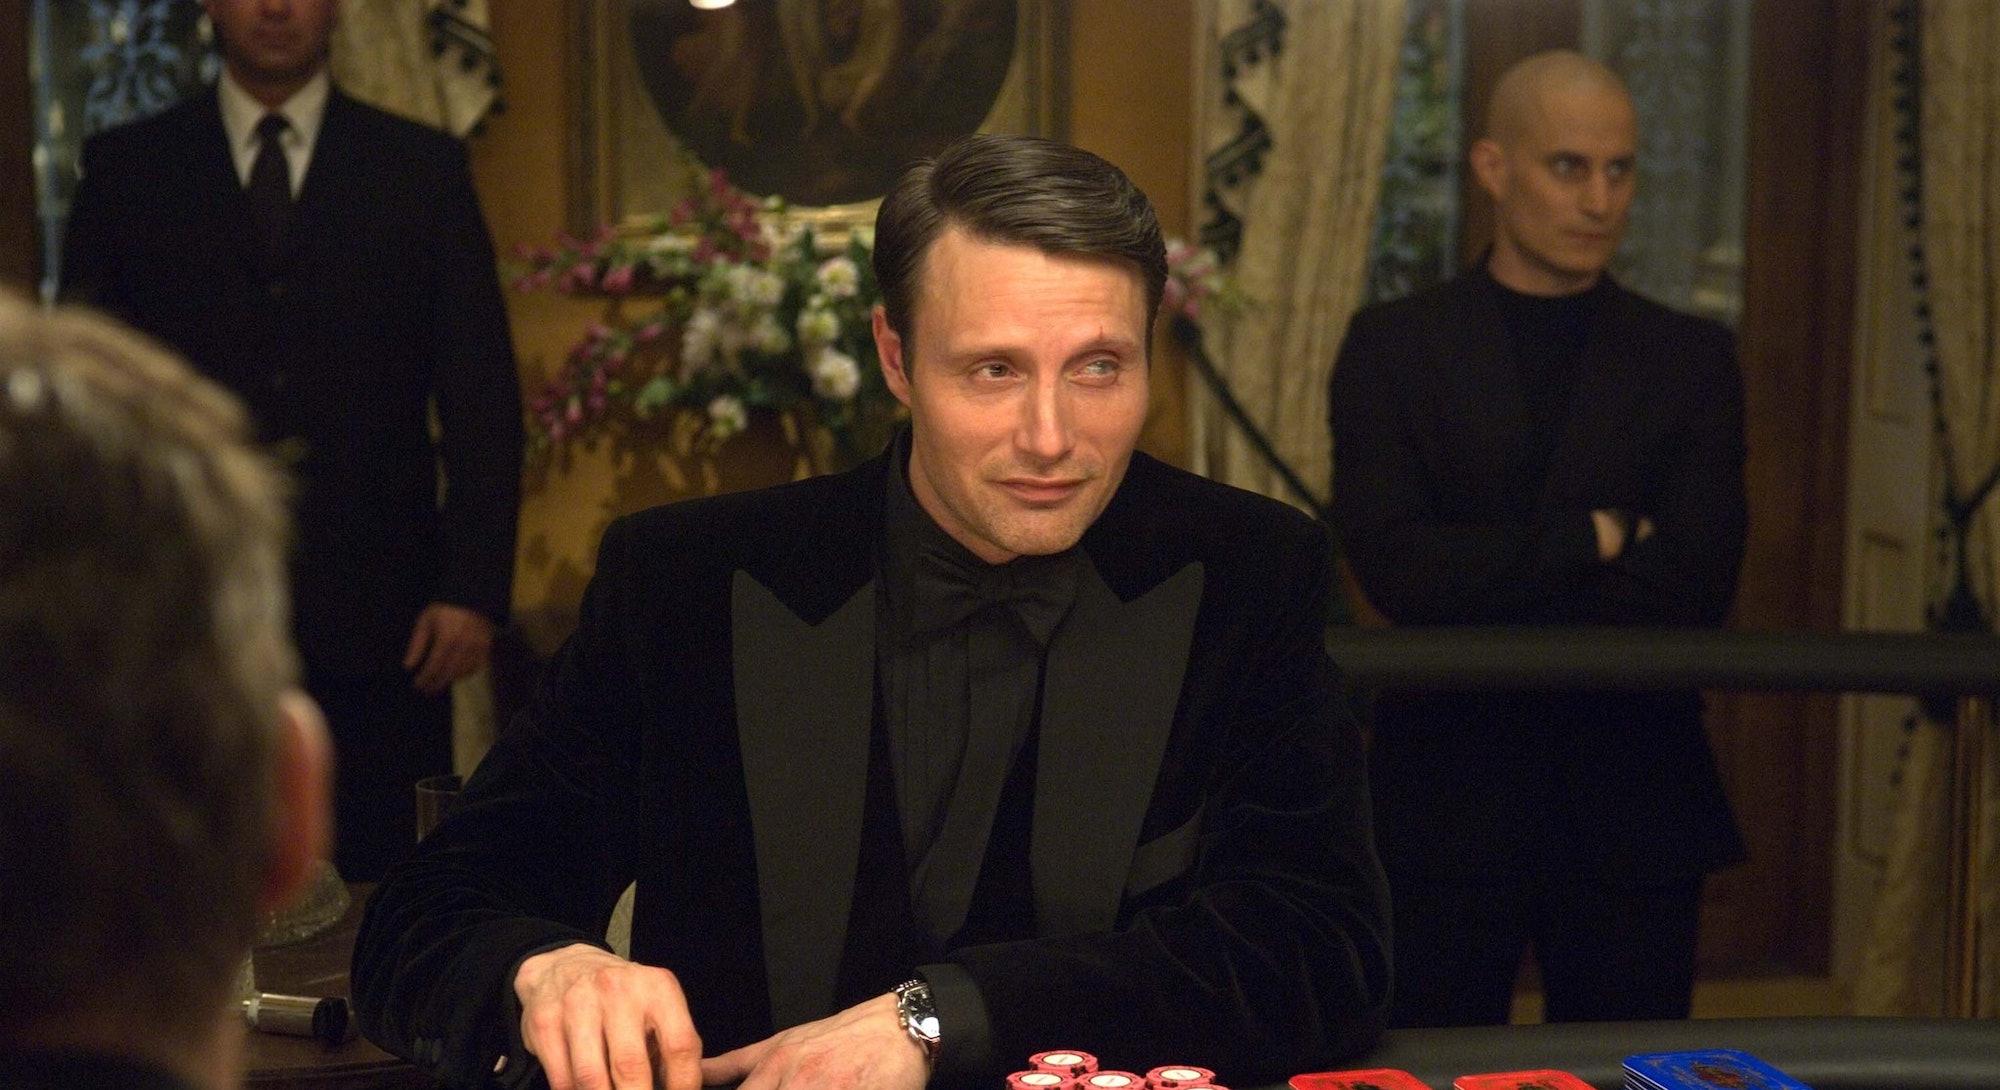 poker table scene from Casino Royale movie